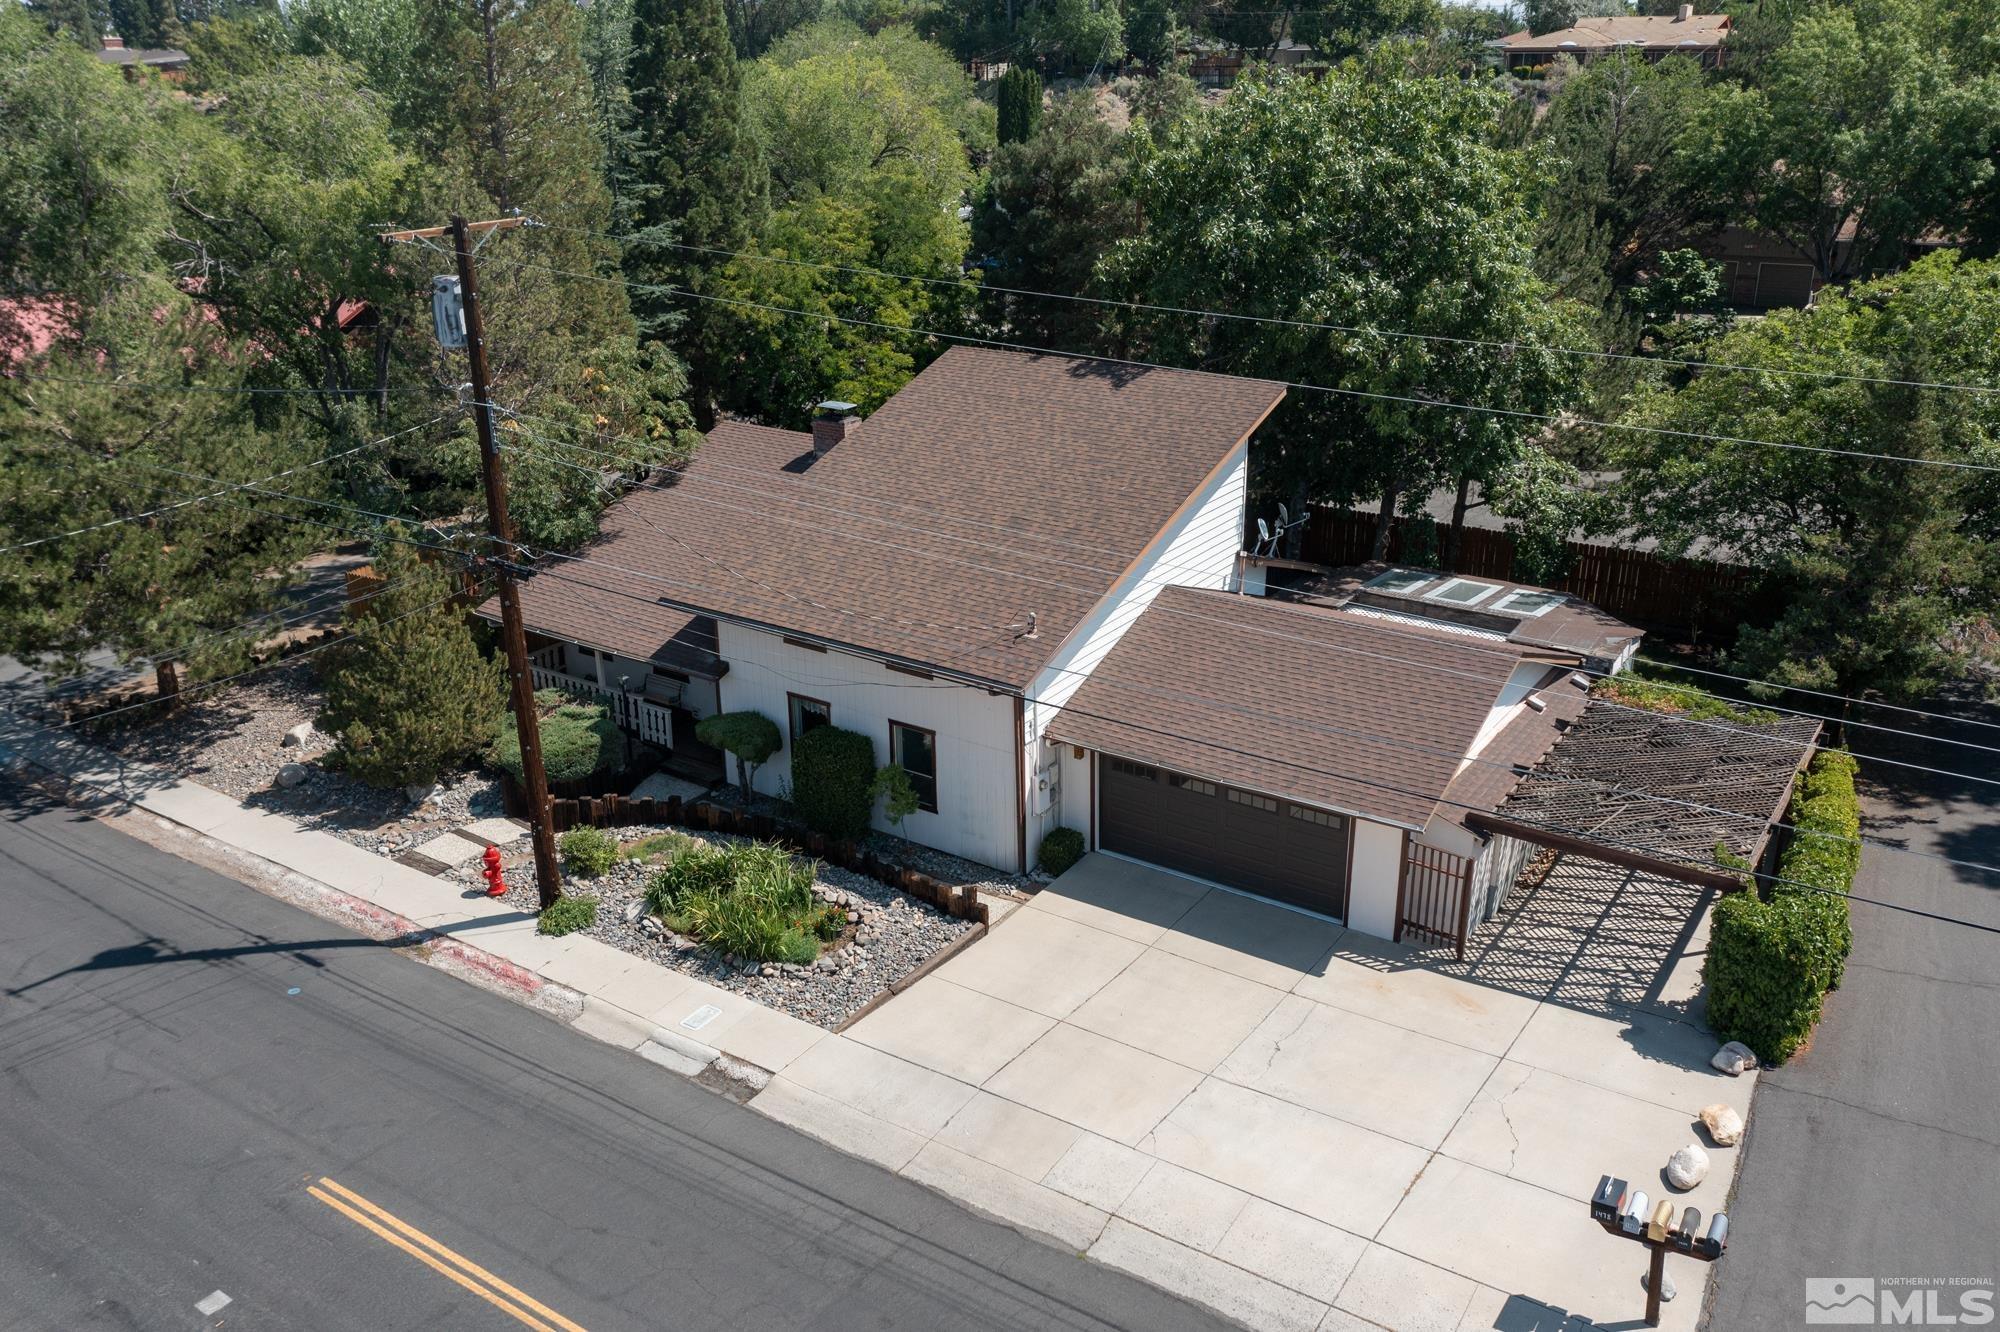 Image for 1480 Clough Road, Reno, NV 89509-3112